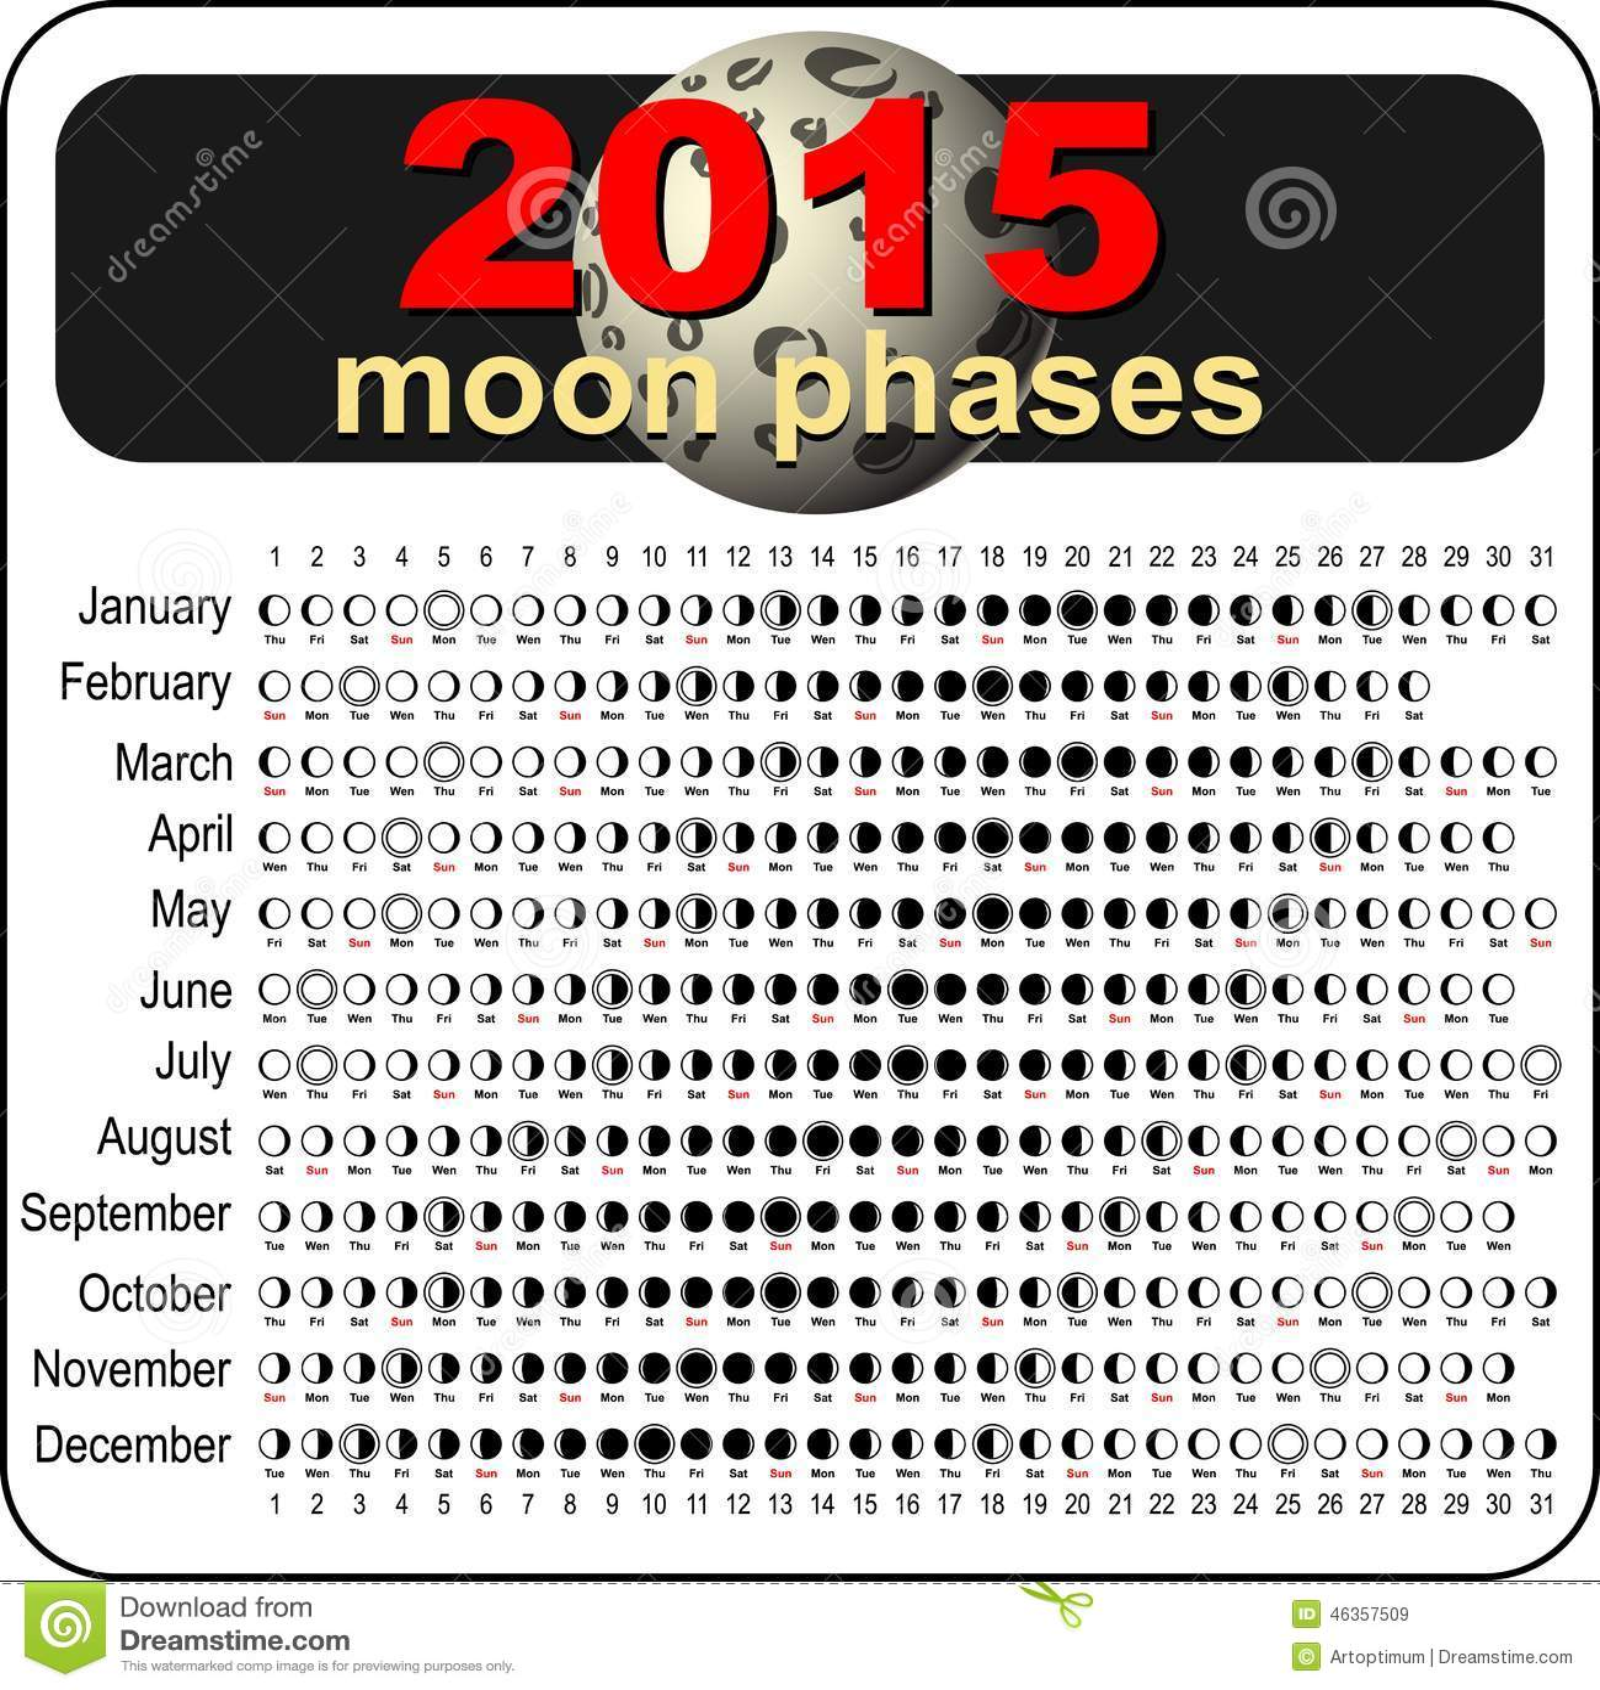 January 2015 Lunar Calendar | Search Results | Calendar 2015